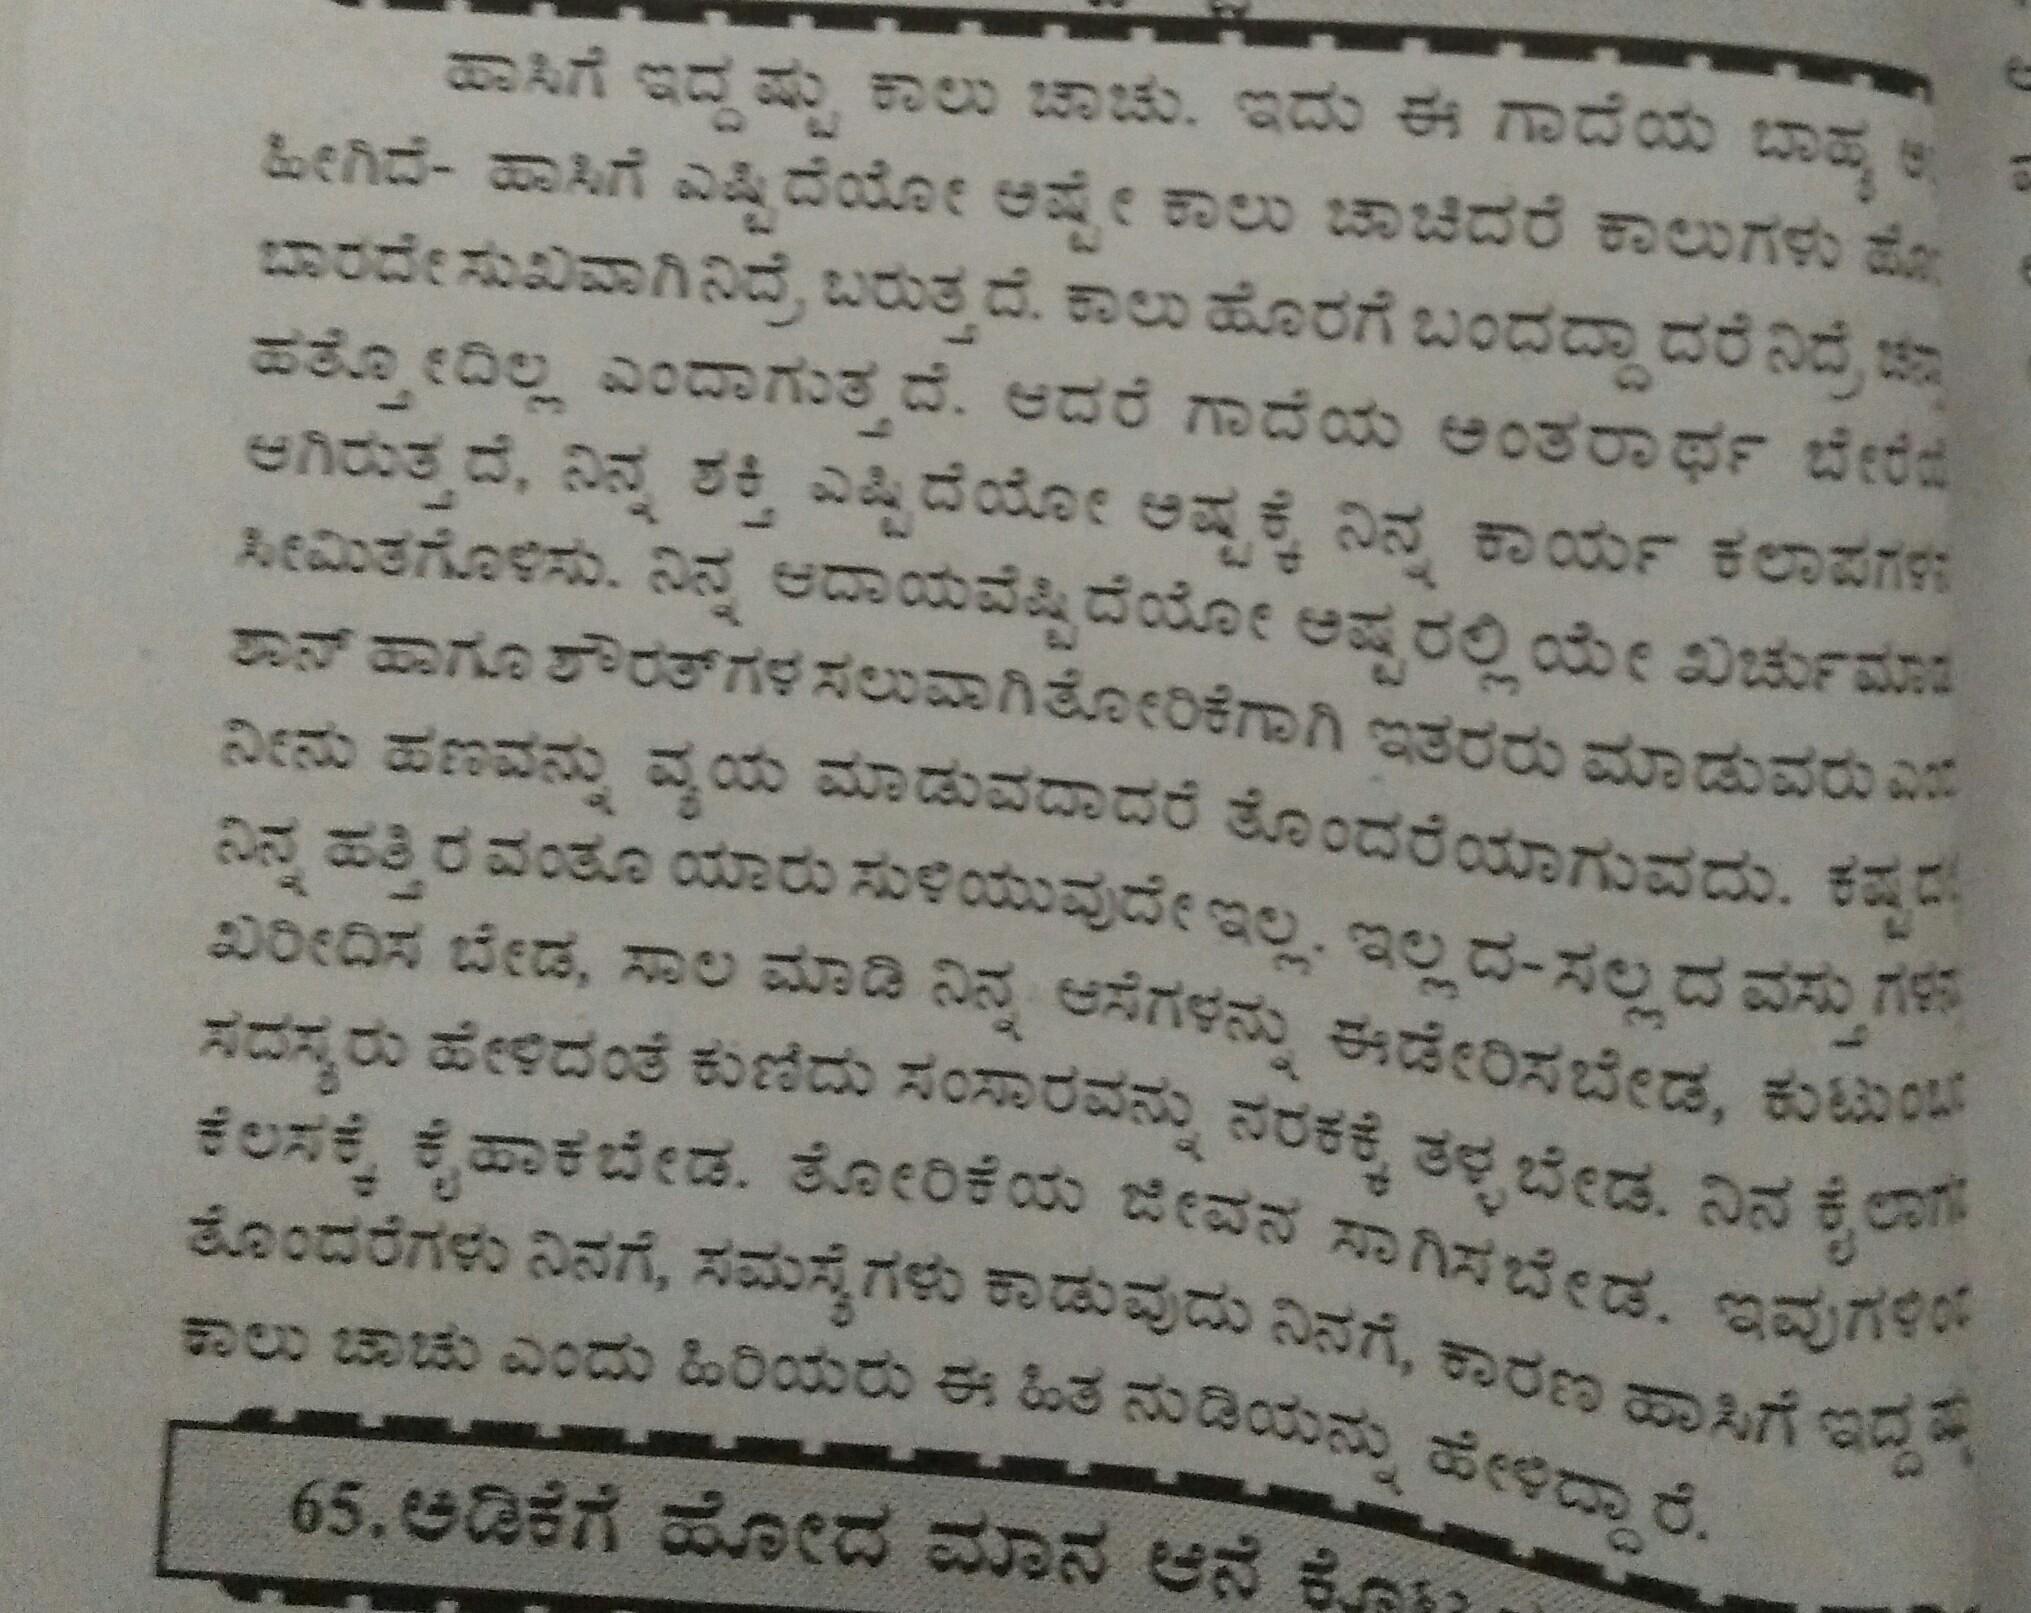 Hasige Idastu Kalu Chachu Explanation In The Kannada